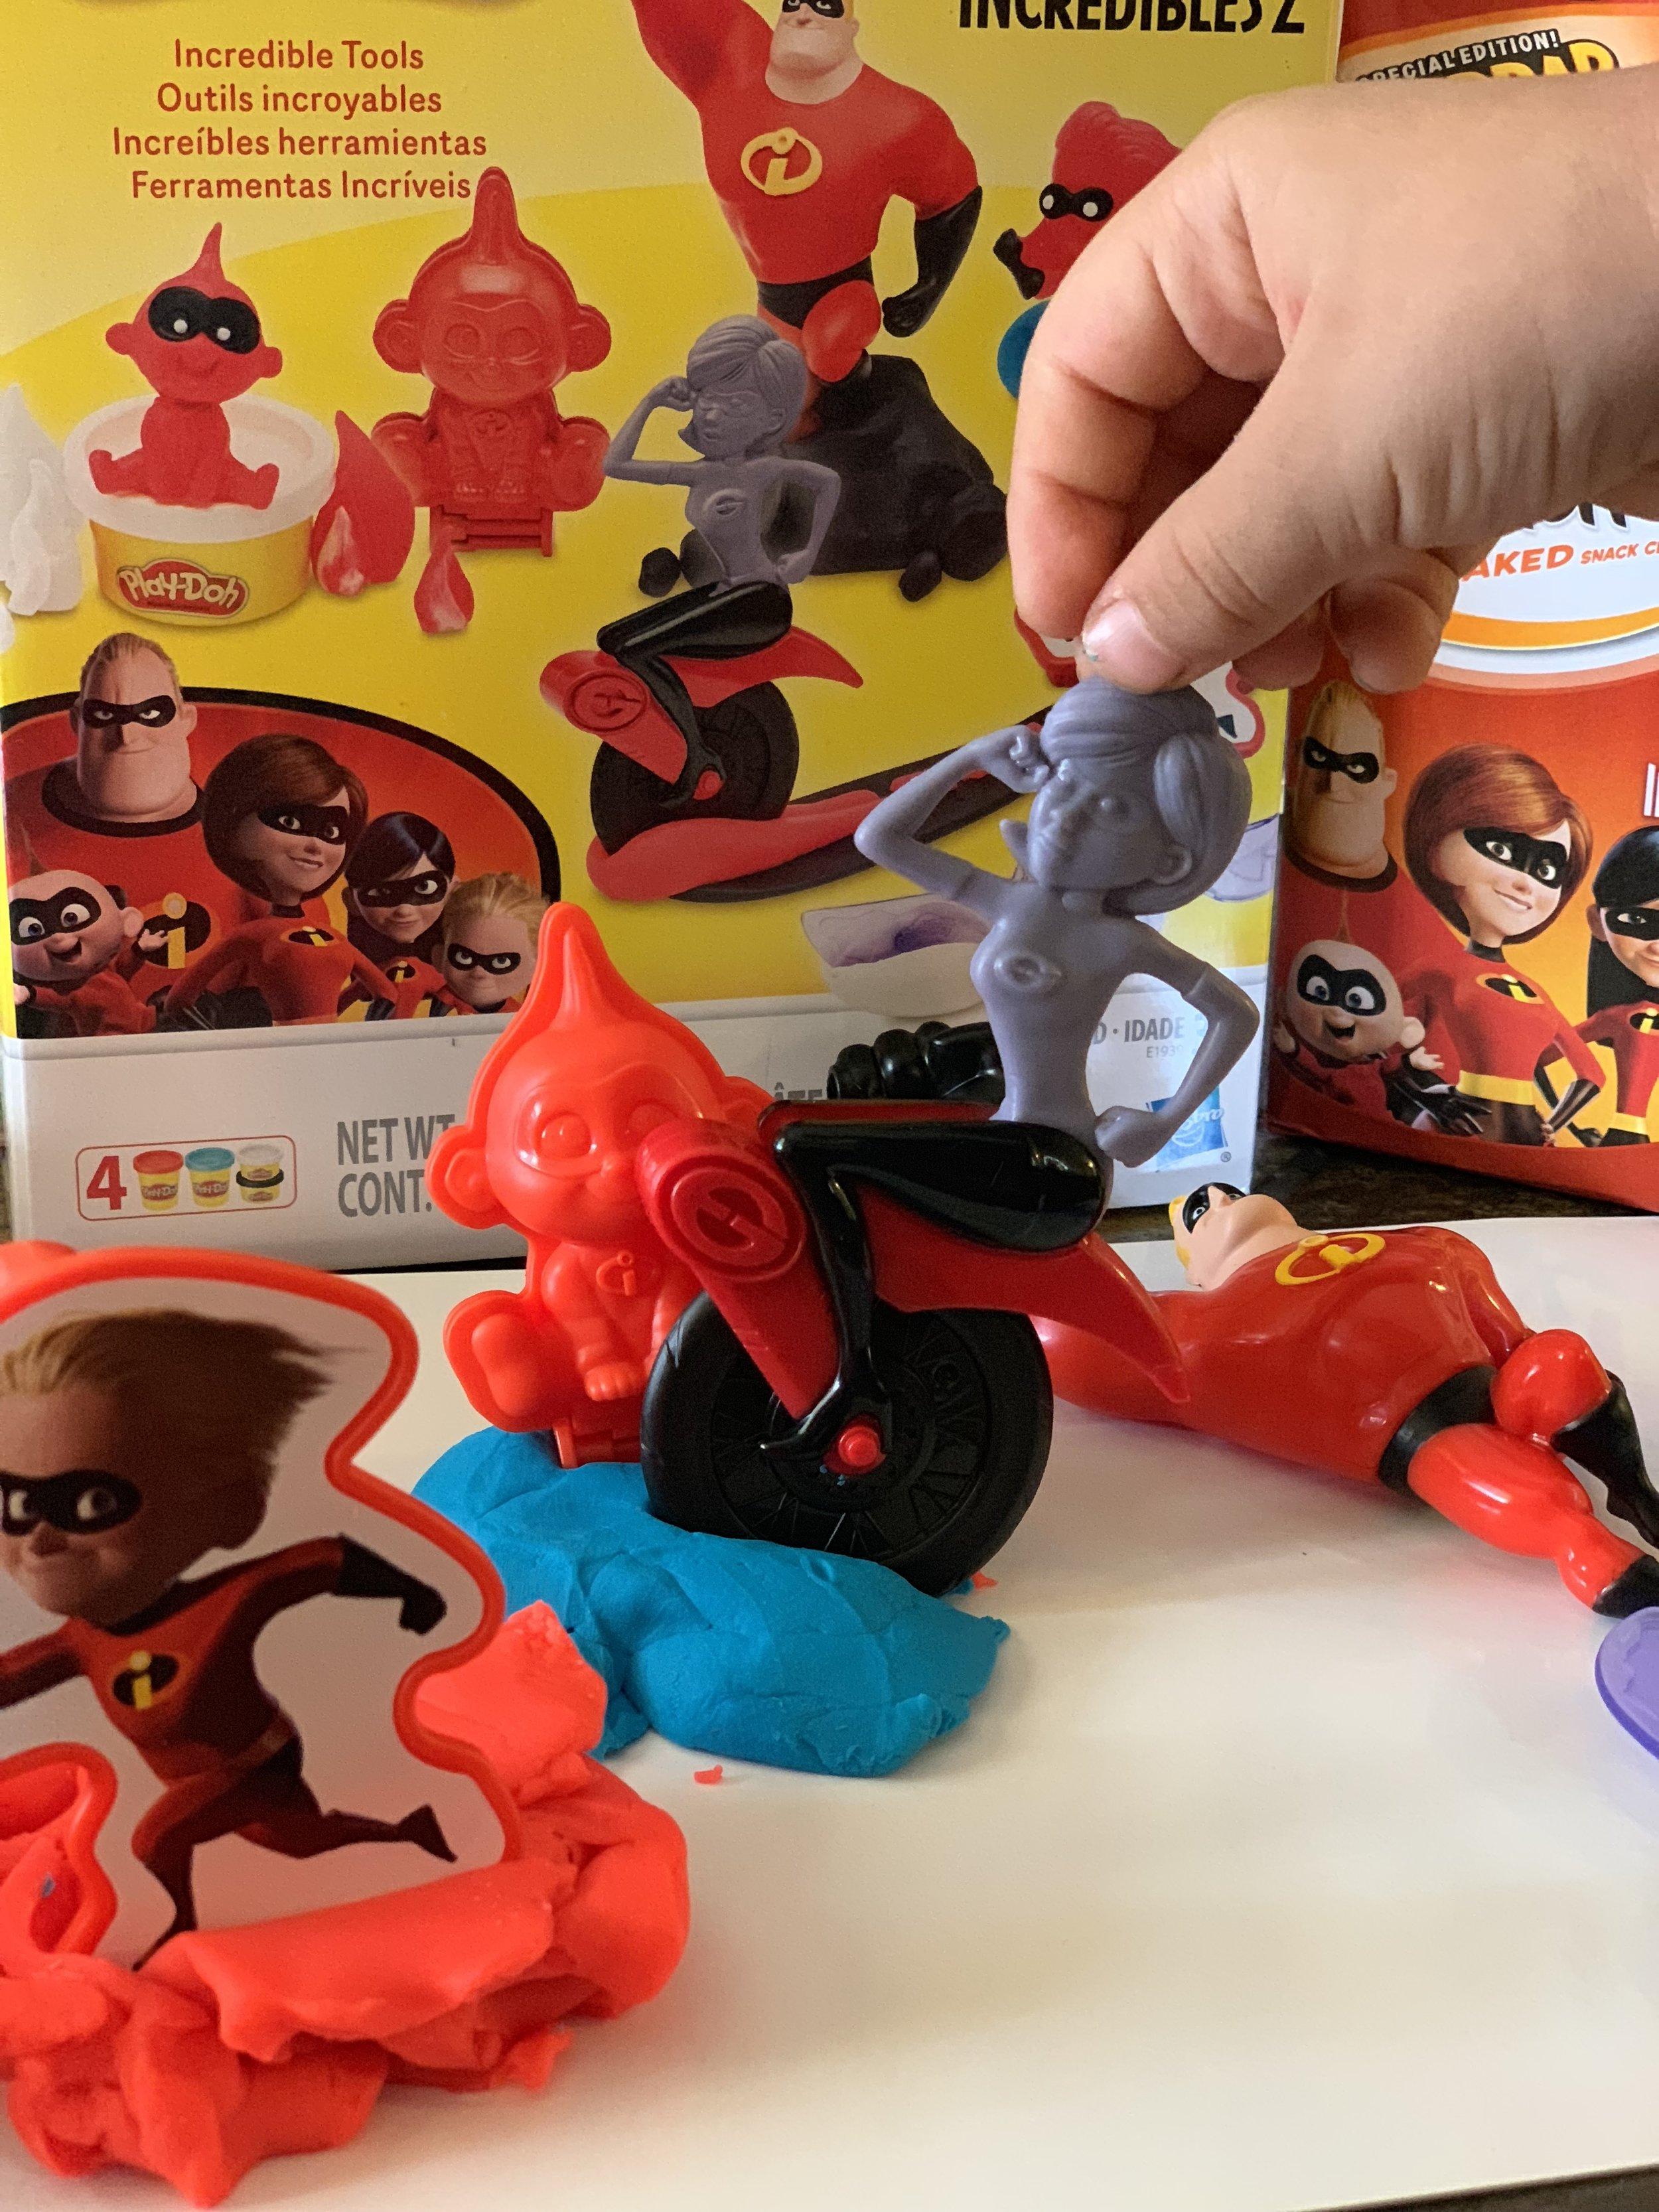 Play-Doh Incredibles 2 set